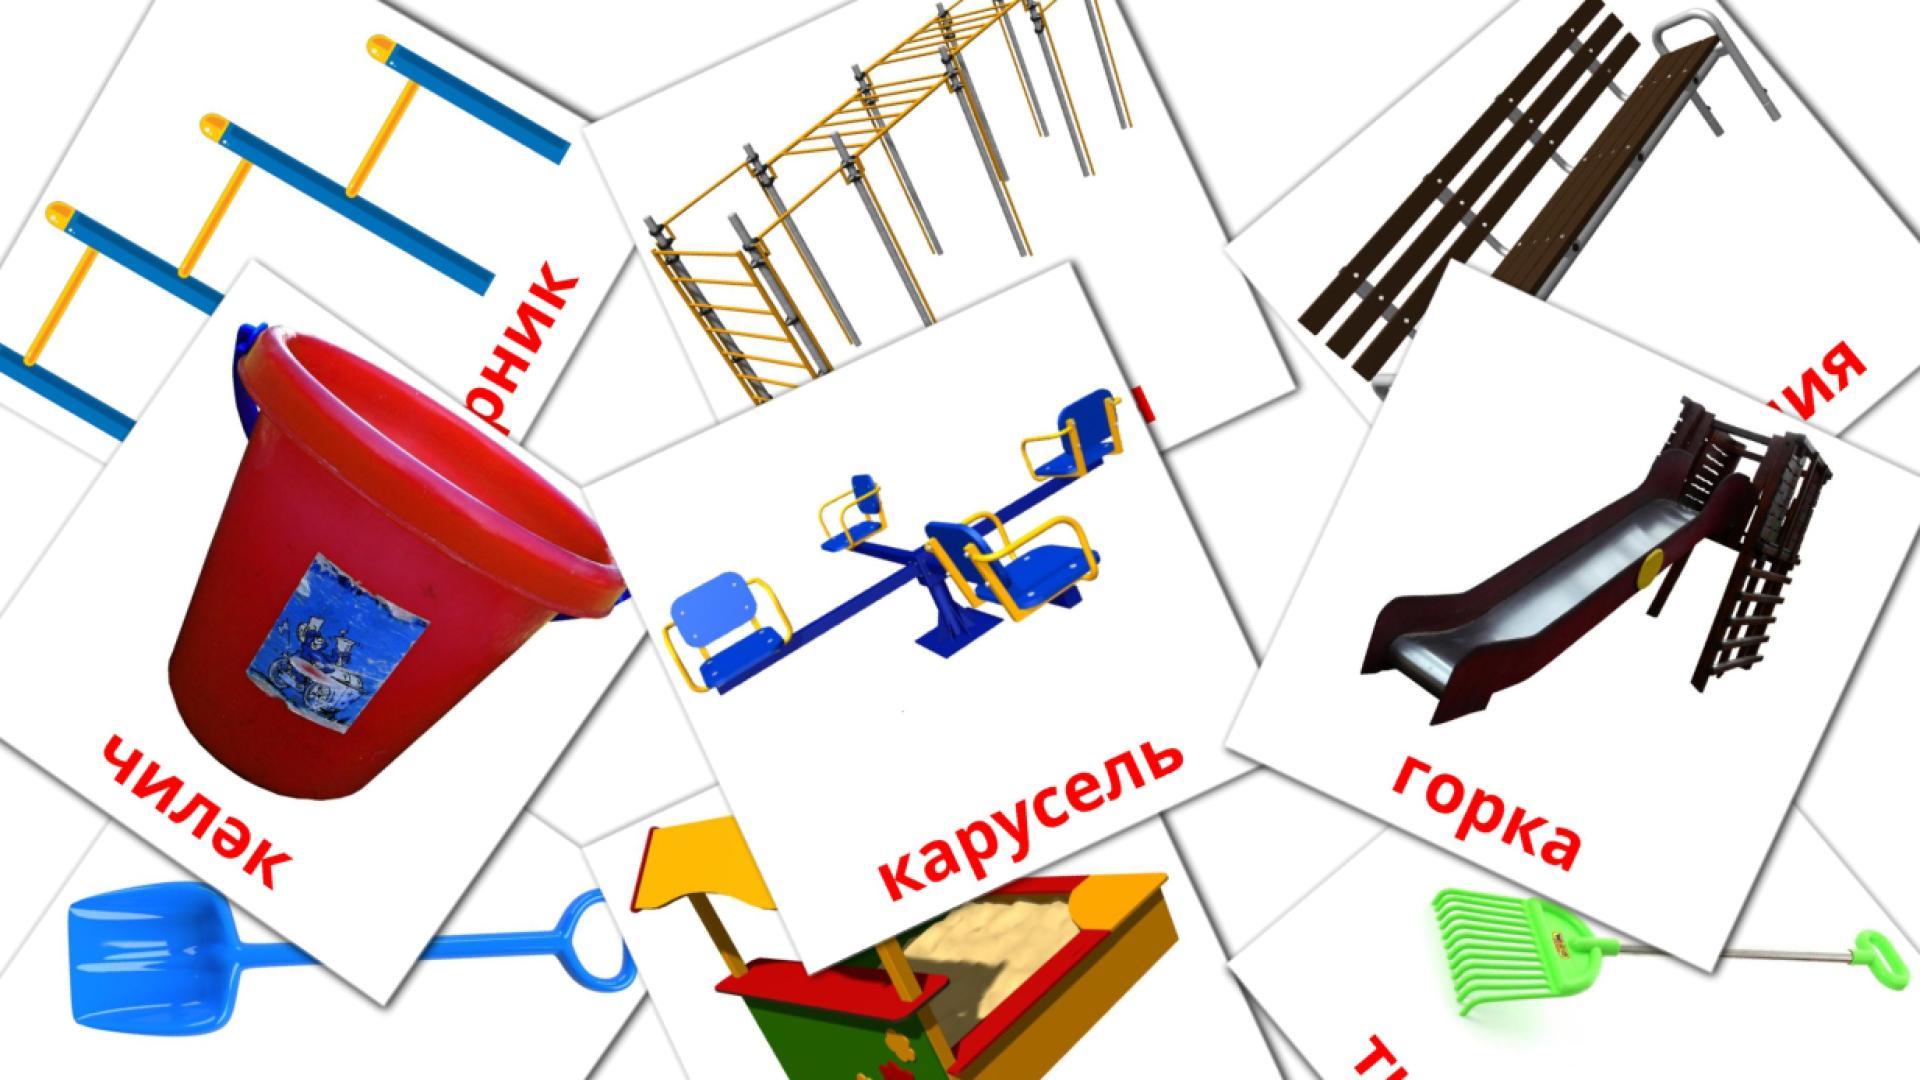 Playground flashcards